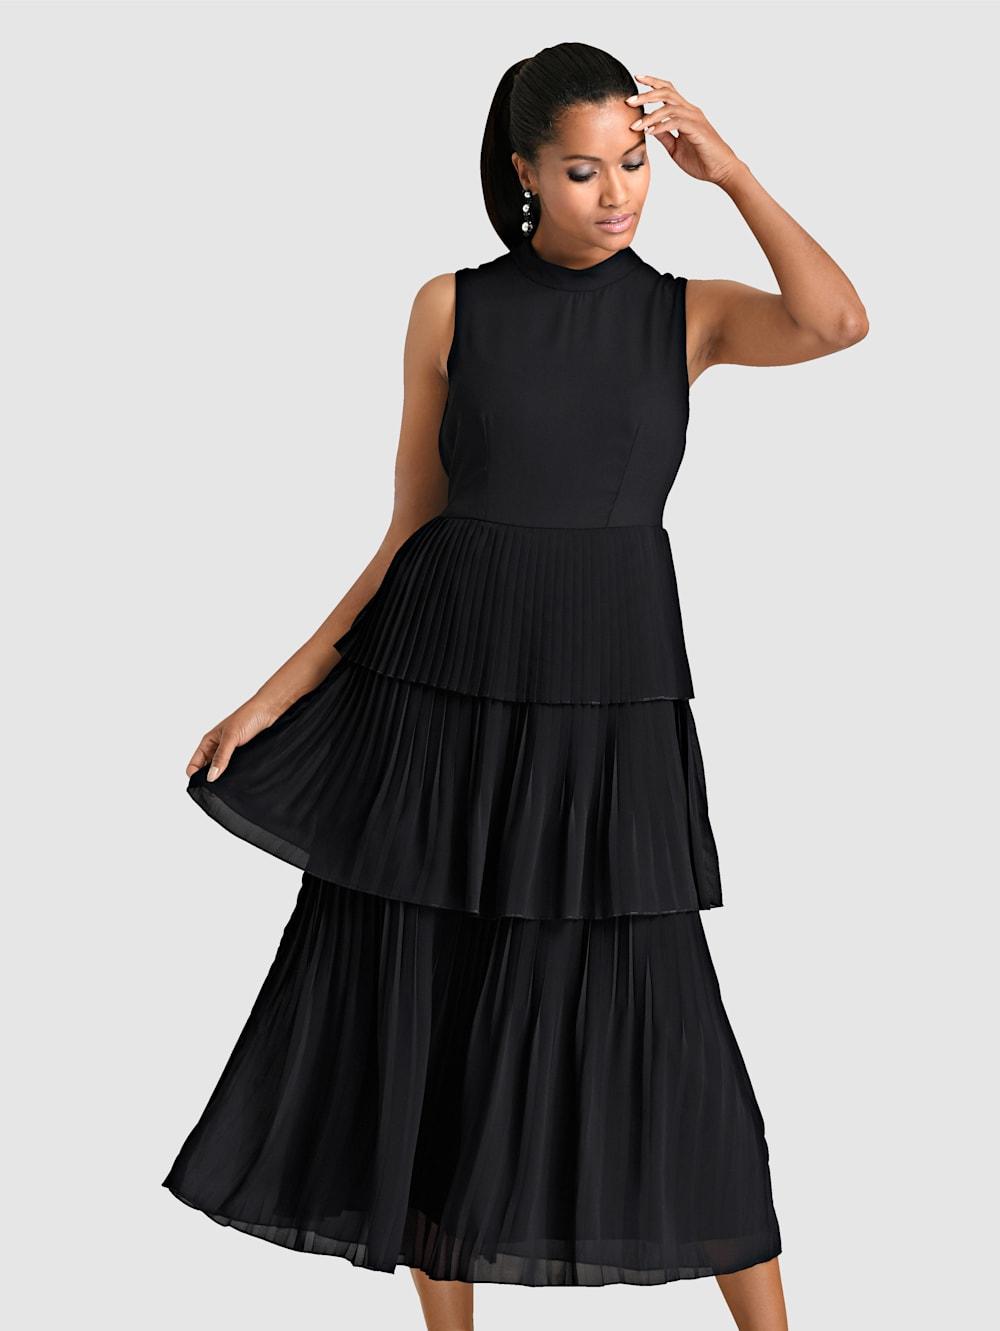 Alba Moda Kleid in Chiffon-Lagen gearbeitet  Klingel